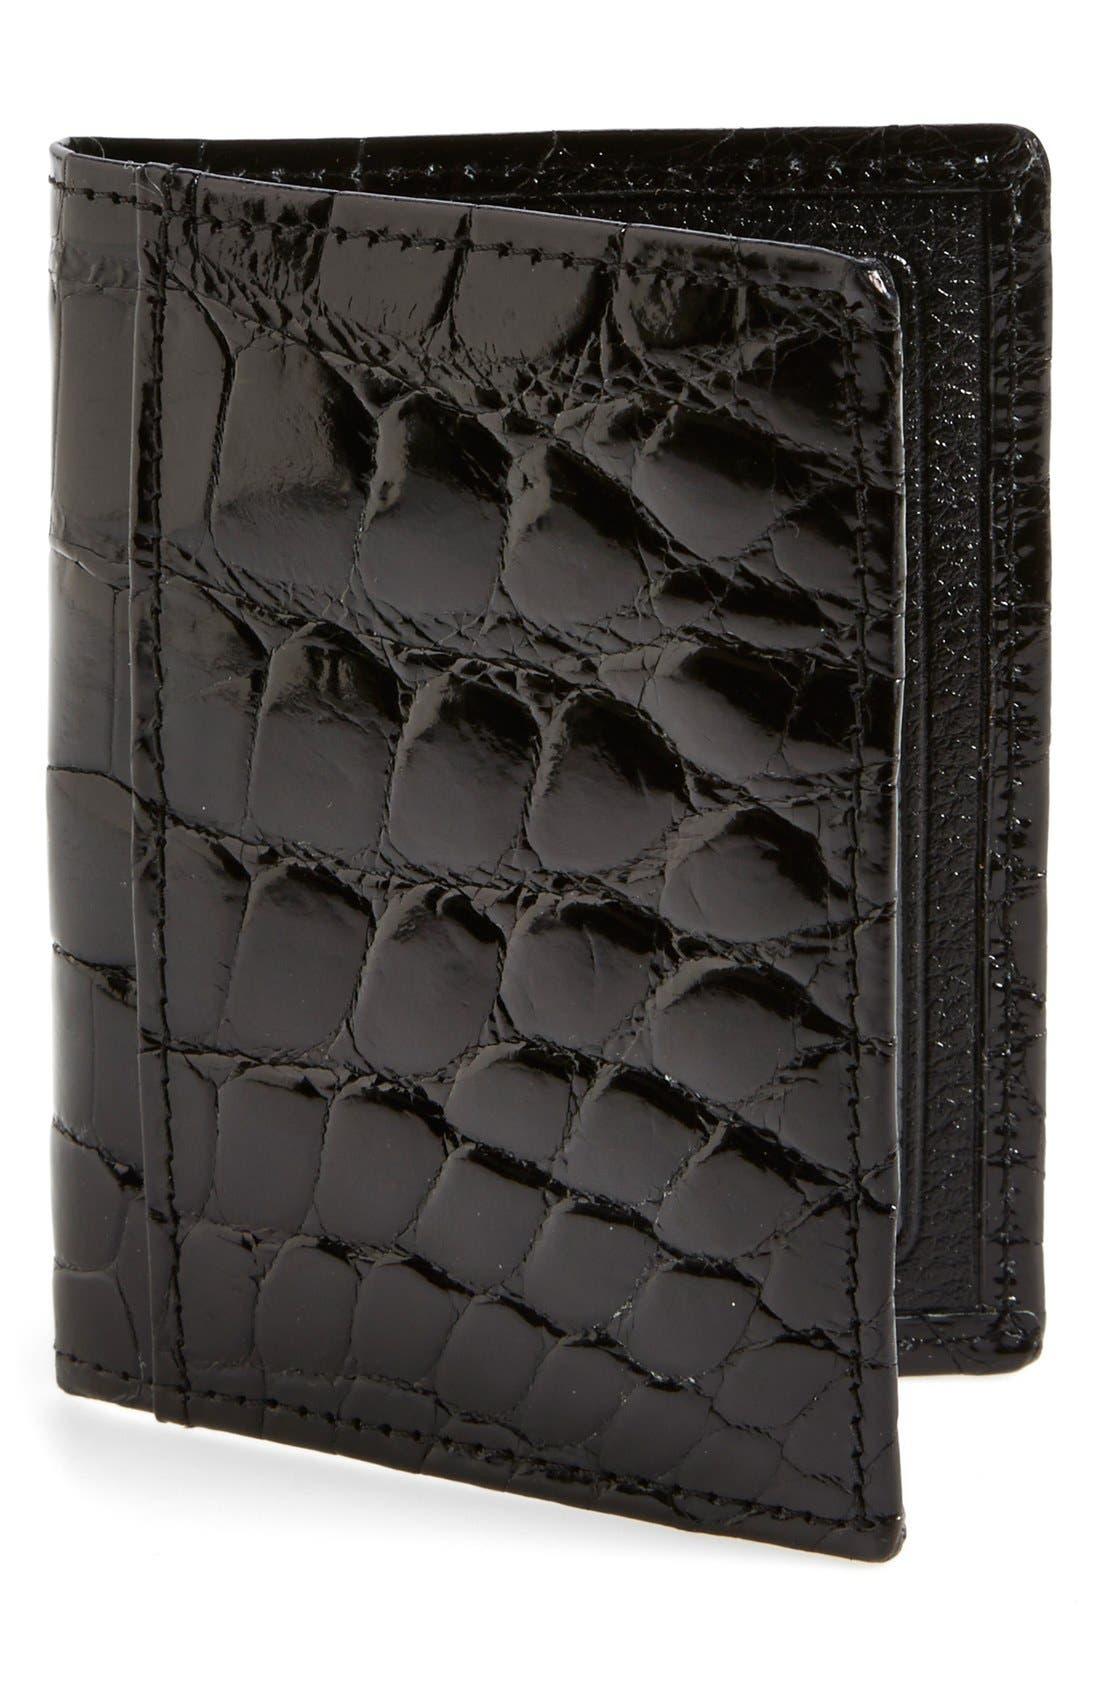 'Joseph' Genuine American Alligator Leather ID Wallet,                         Main,                         color, 001